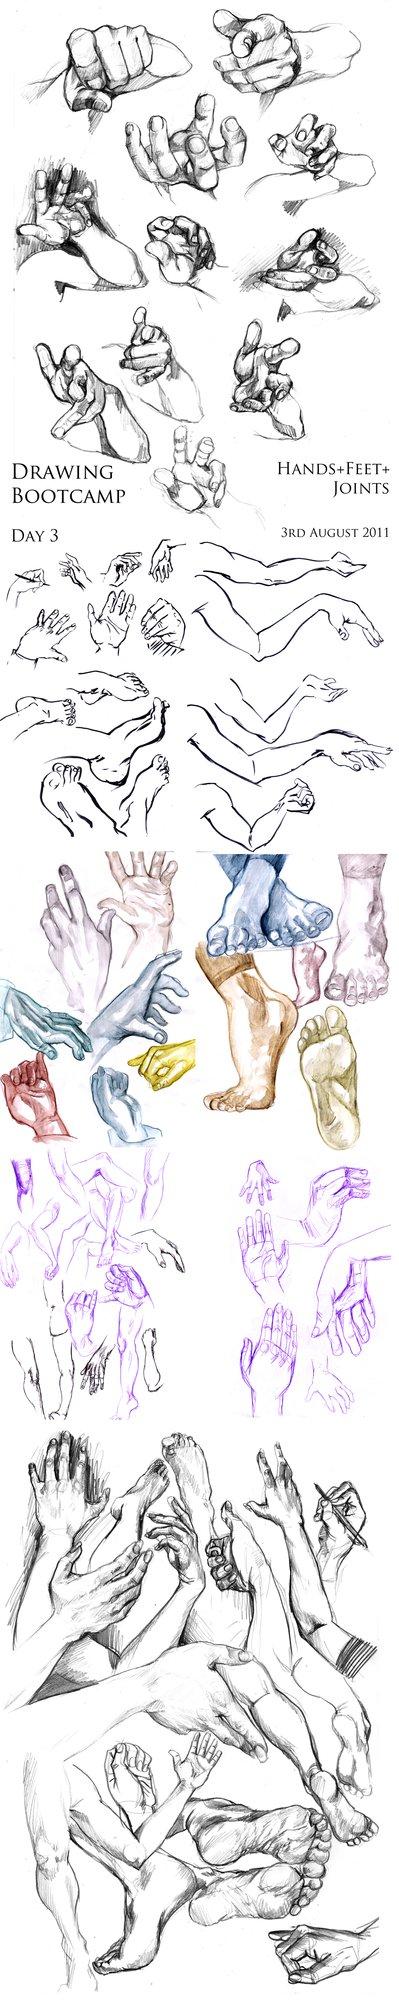 3-Aug-2011. Hands+Feet+Joints by Kayla0 | Artwork cartoon ...